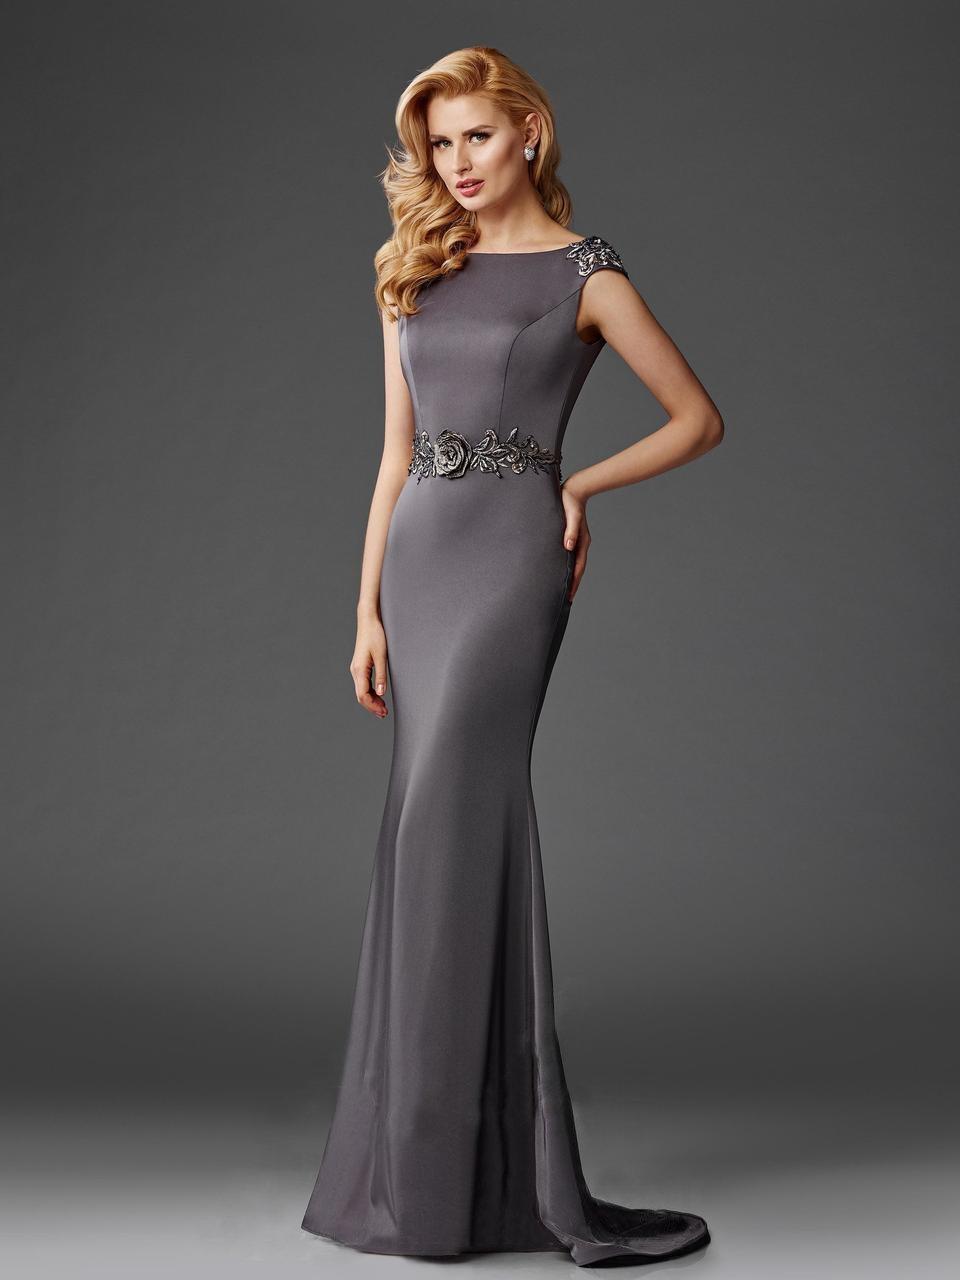 Clarisse - M6447 Bedazzled Bateau Sheath Dress